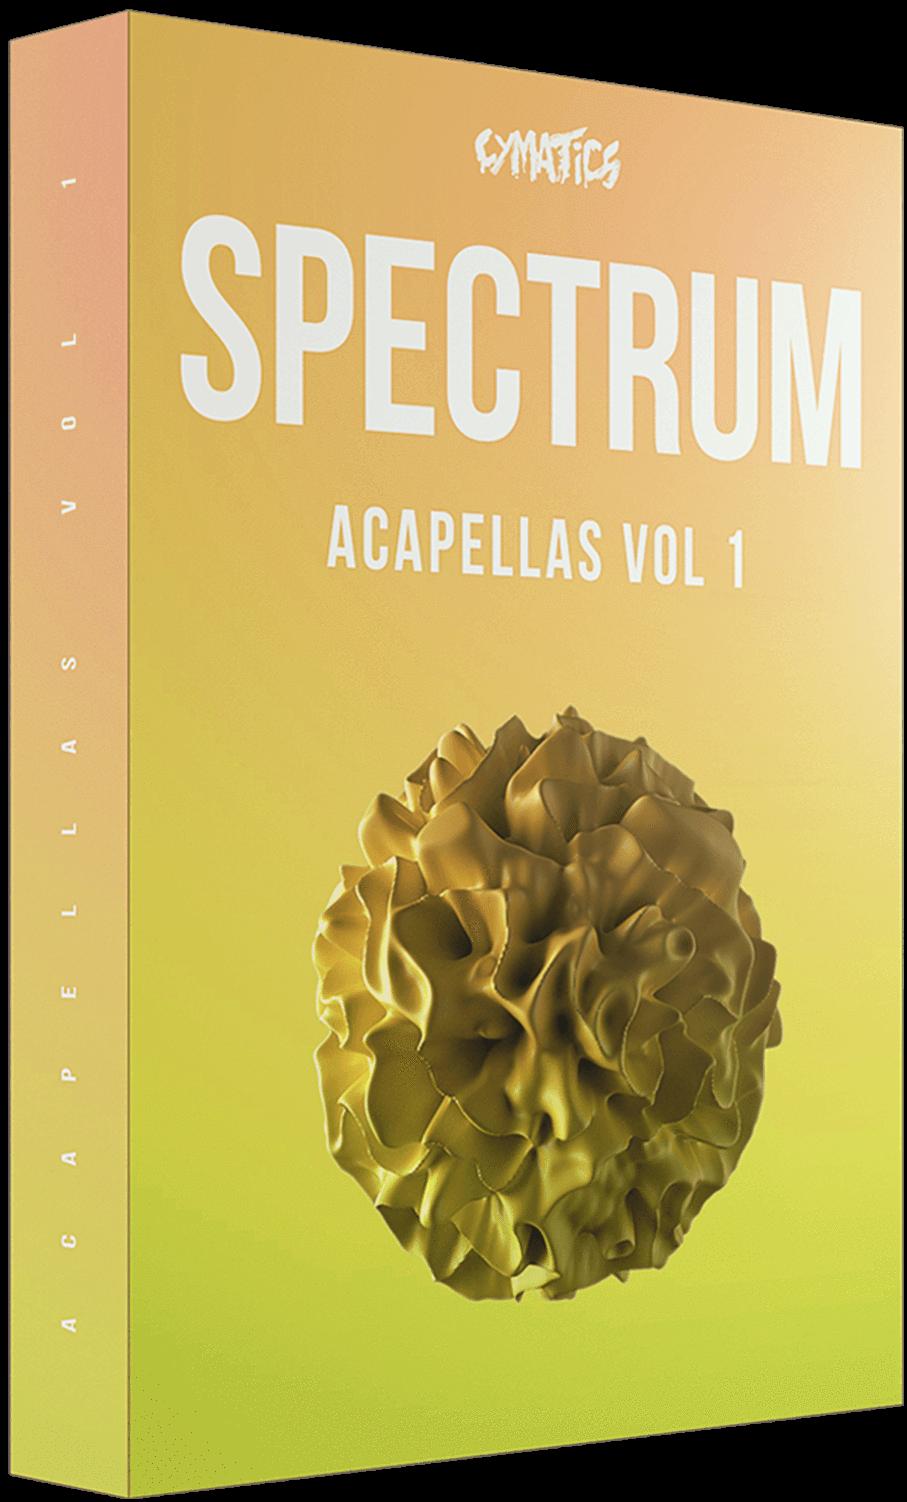 Spectrum Acapellas | Free Download | Zeeb Crack